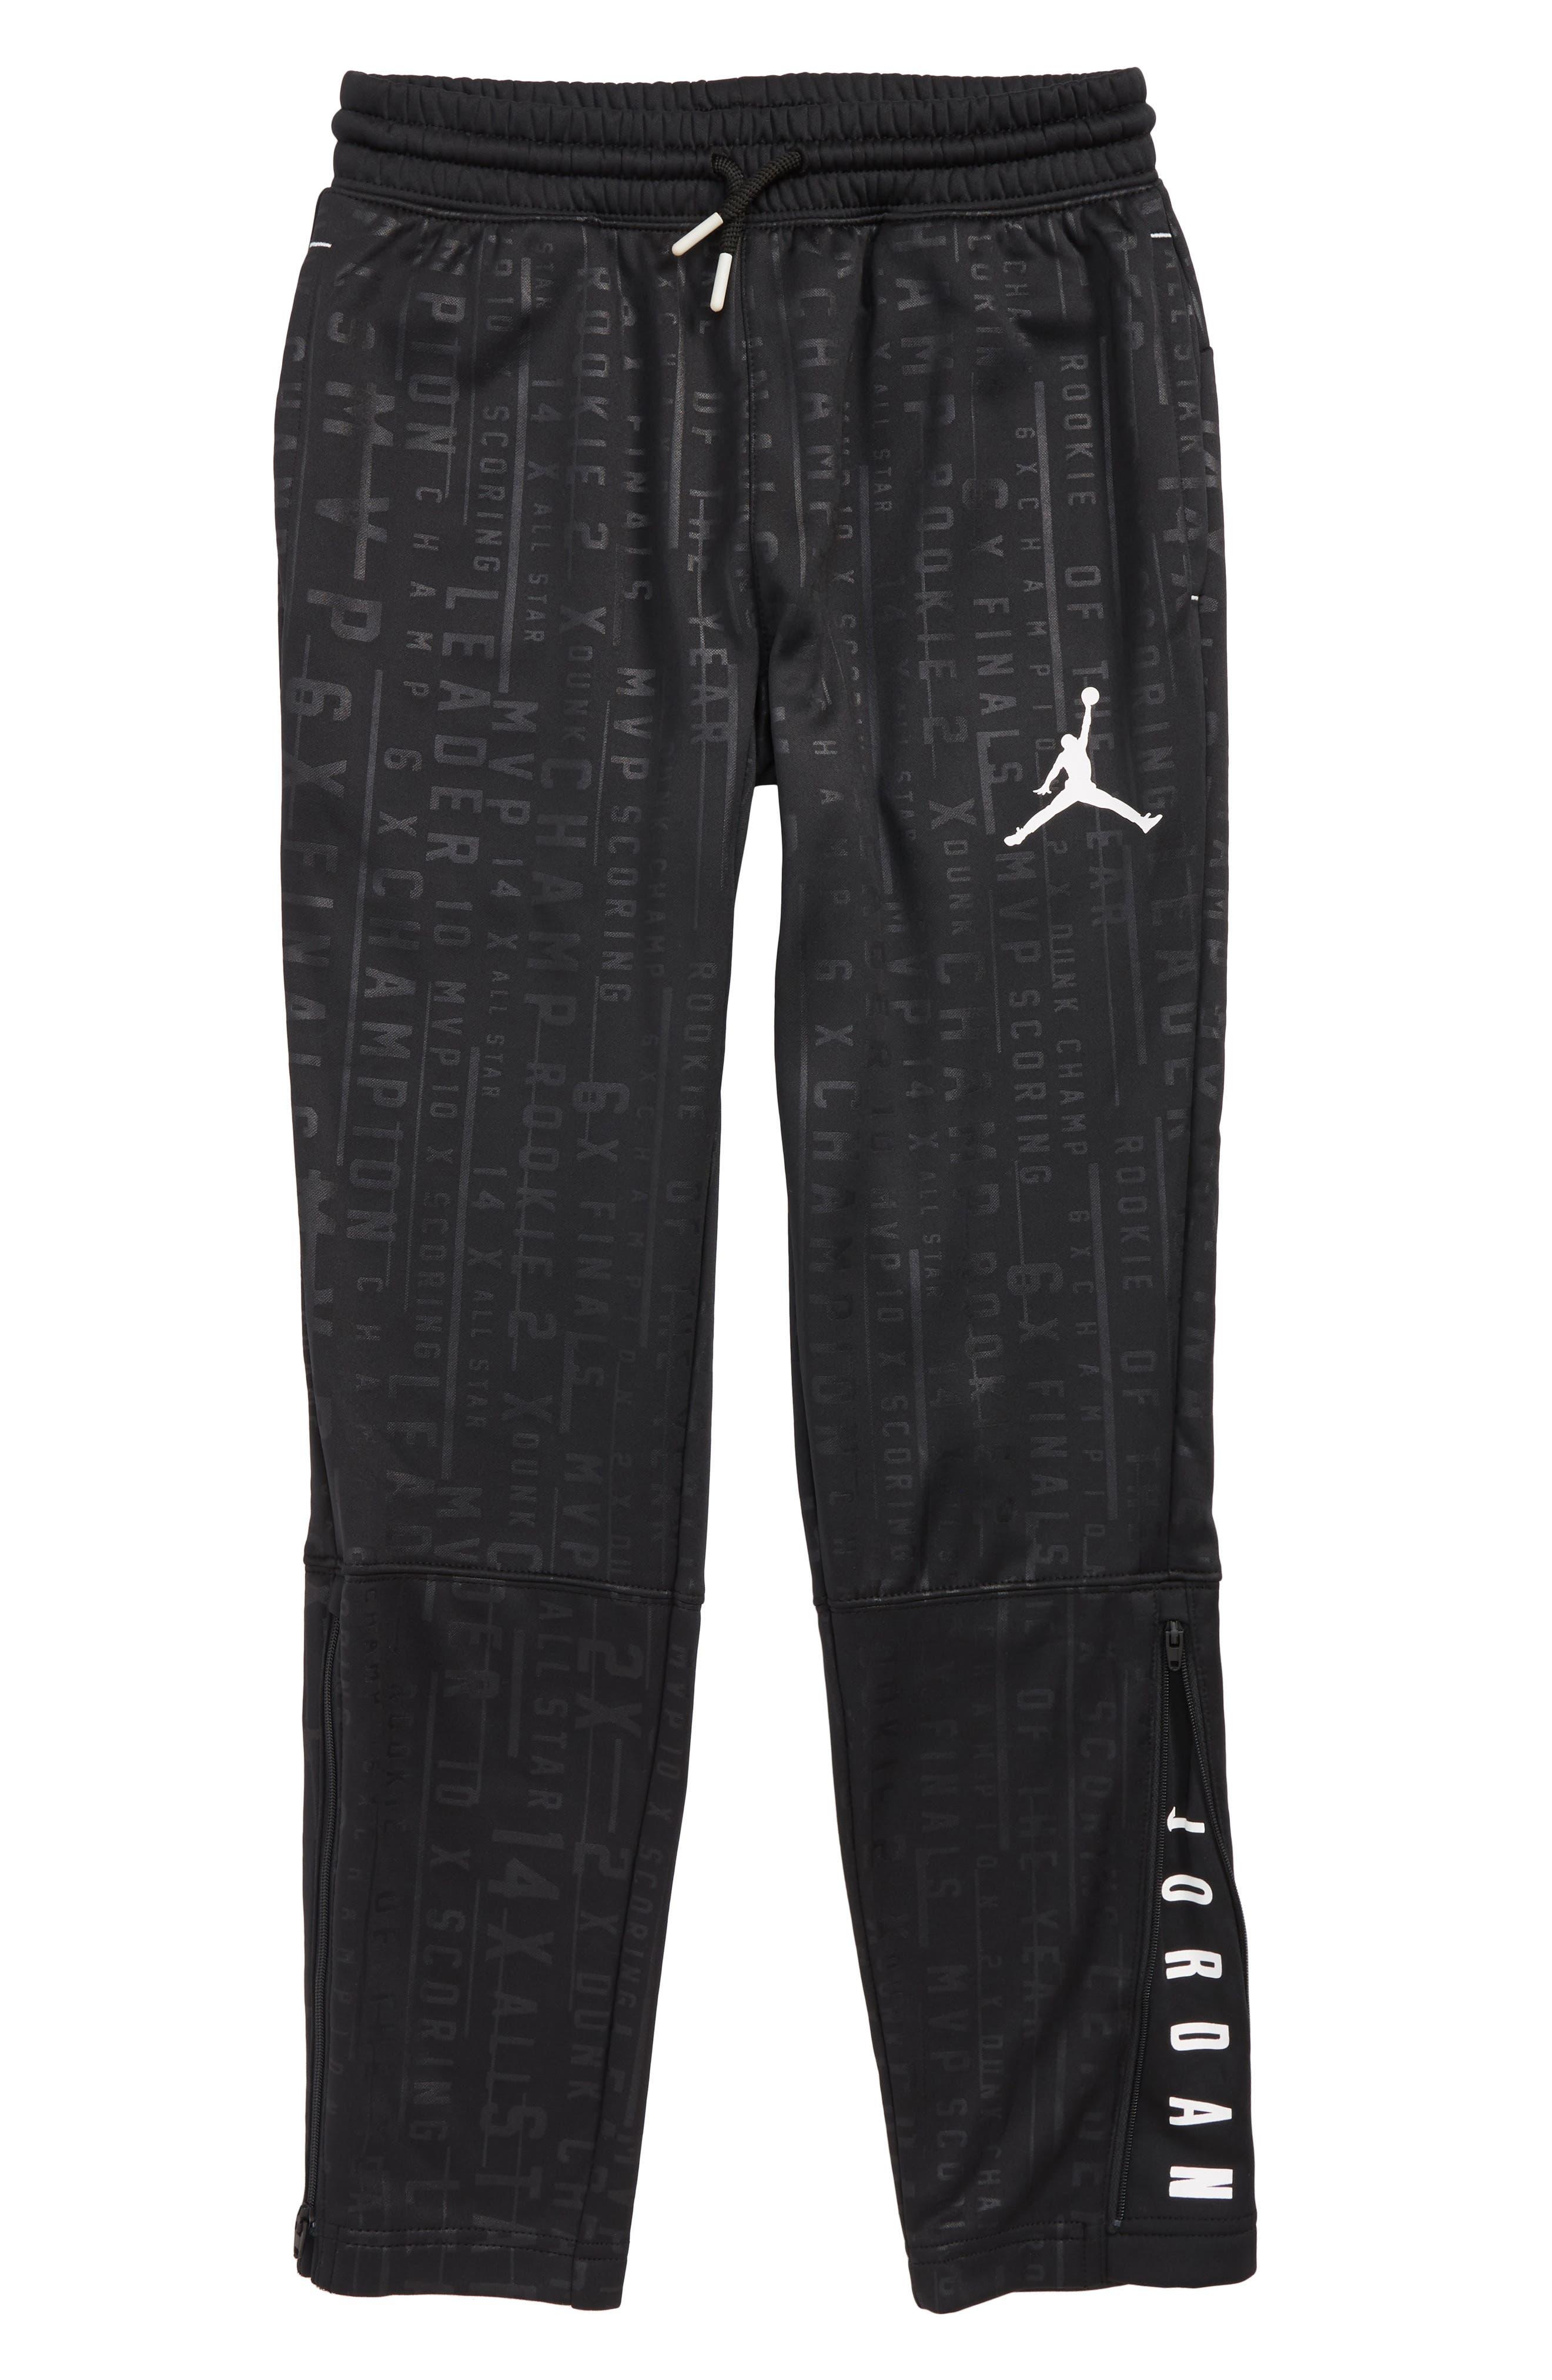 Jordan Tech Accolades Pants,                             Main thumbnail 1, color,                             BLACK/ WHITE